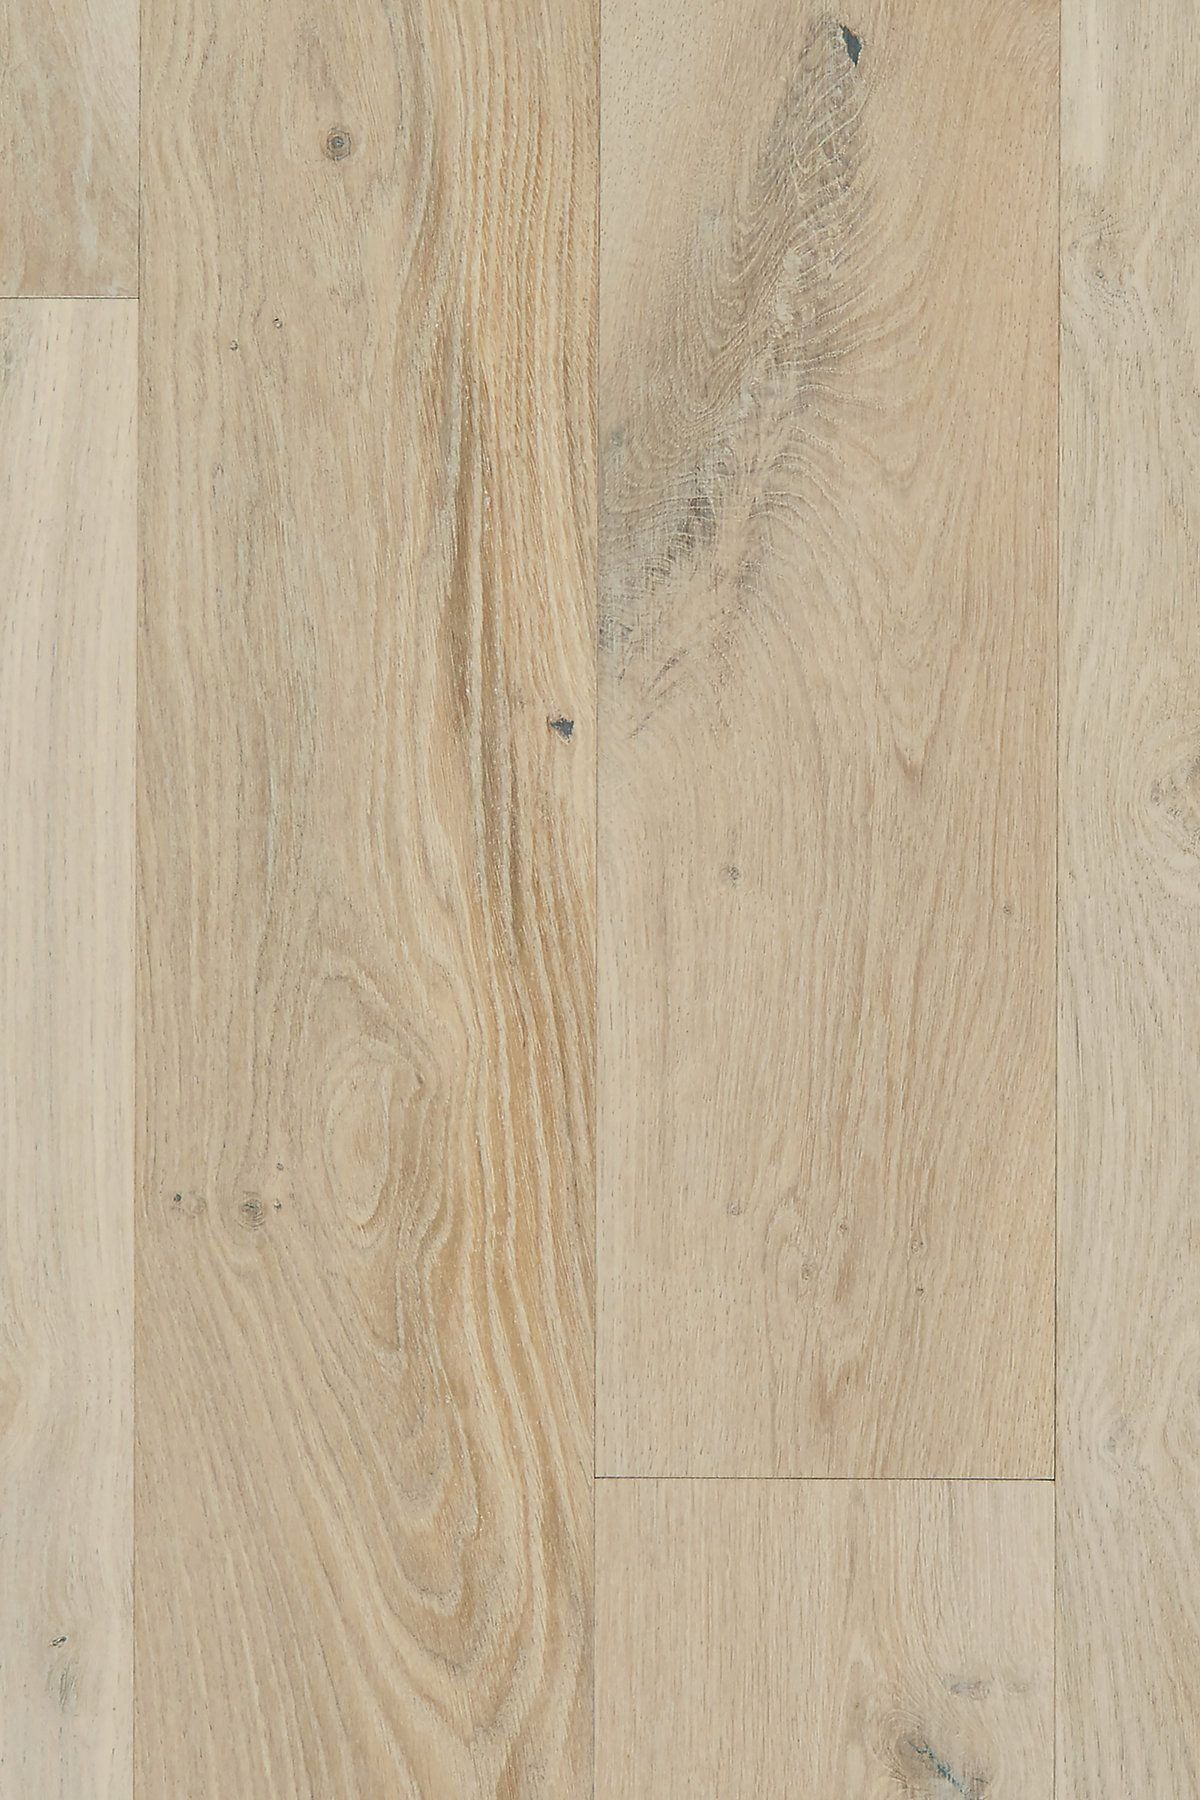 Wood Flooring 1000 Sq Ft